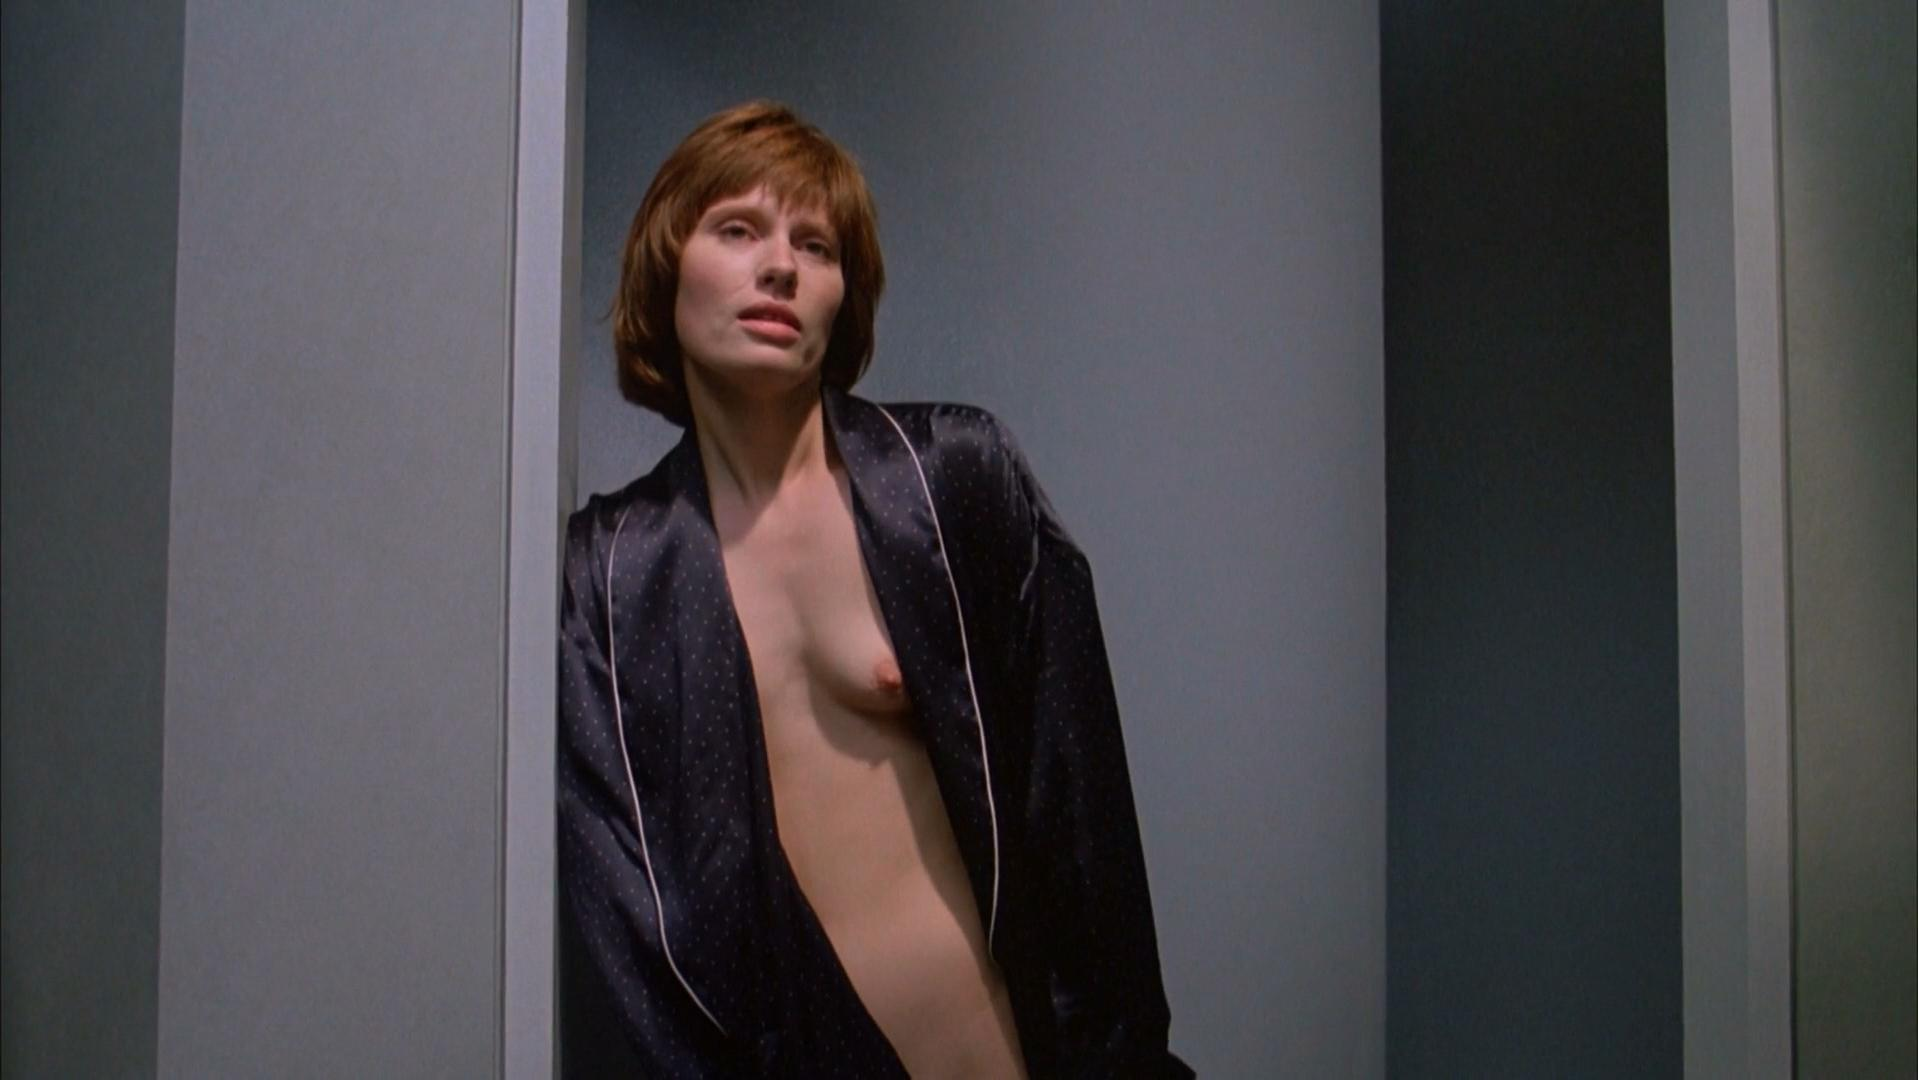 Heidi von Palleske nude, Genevieve Bujold nude - Dead Ringers (1988)